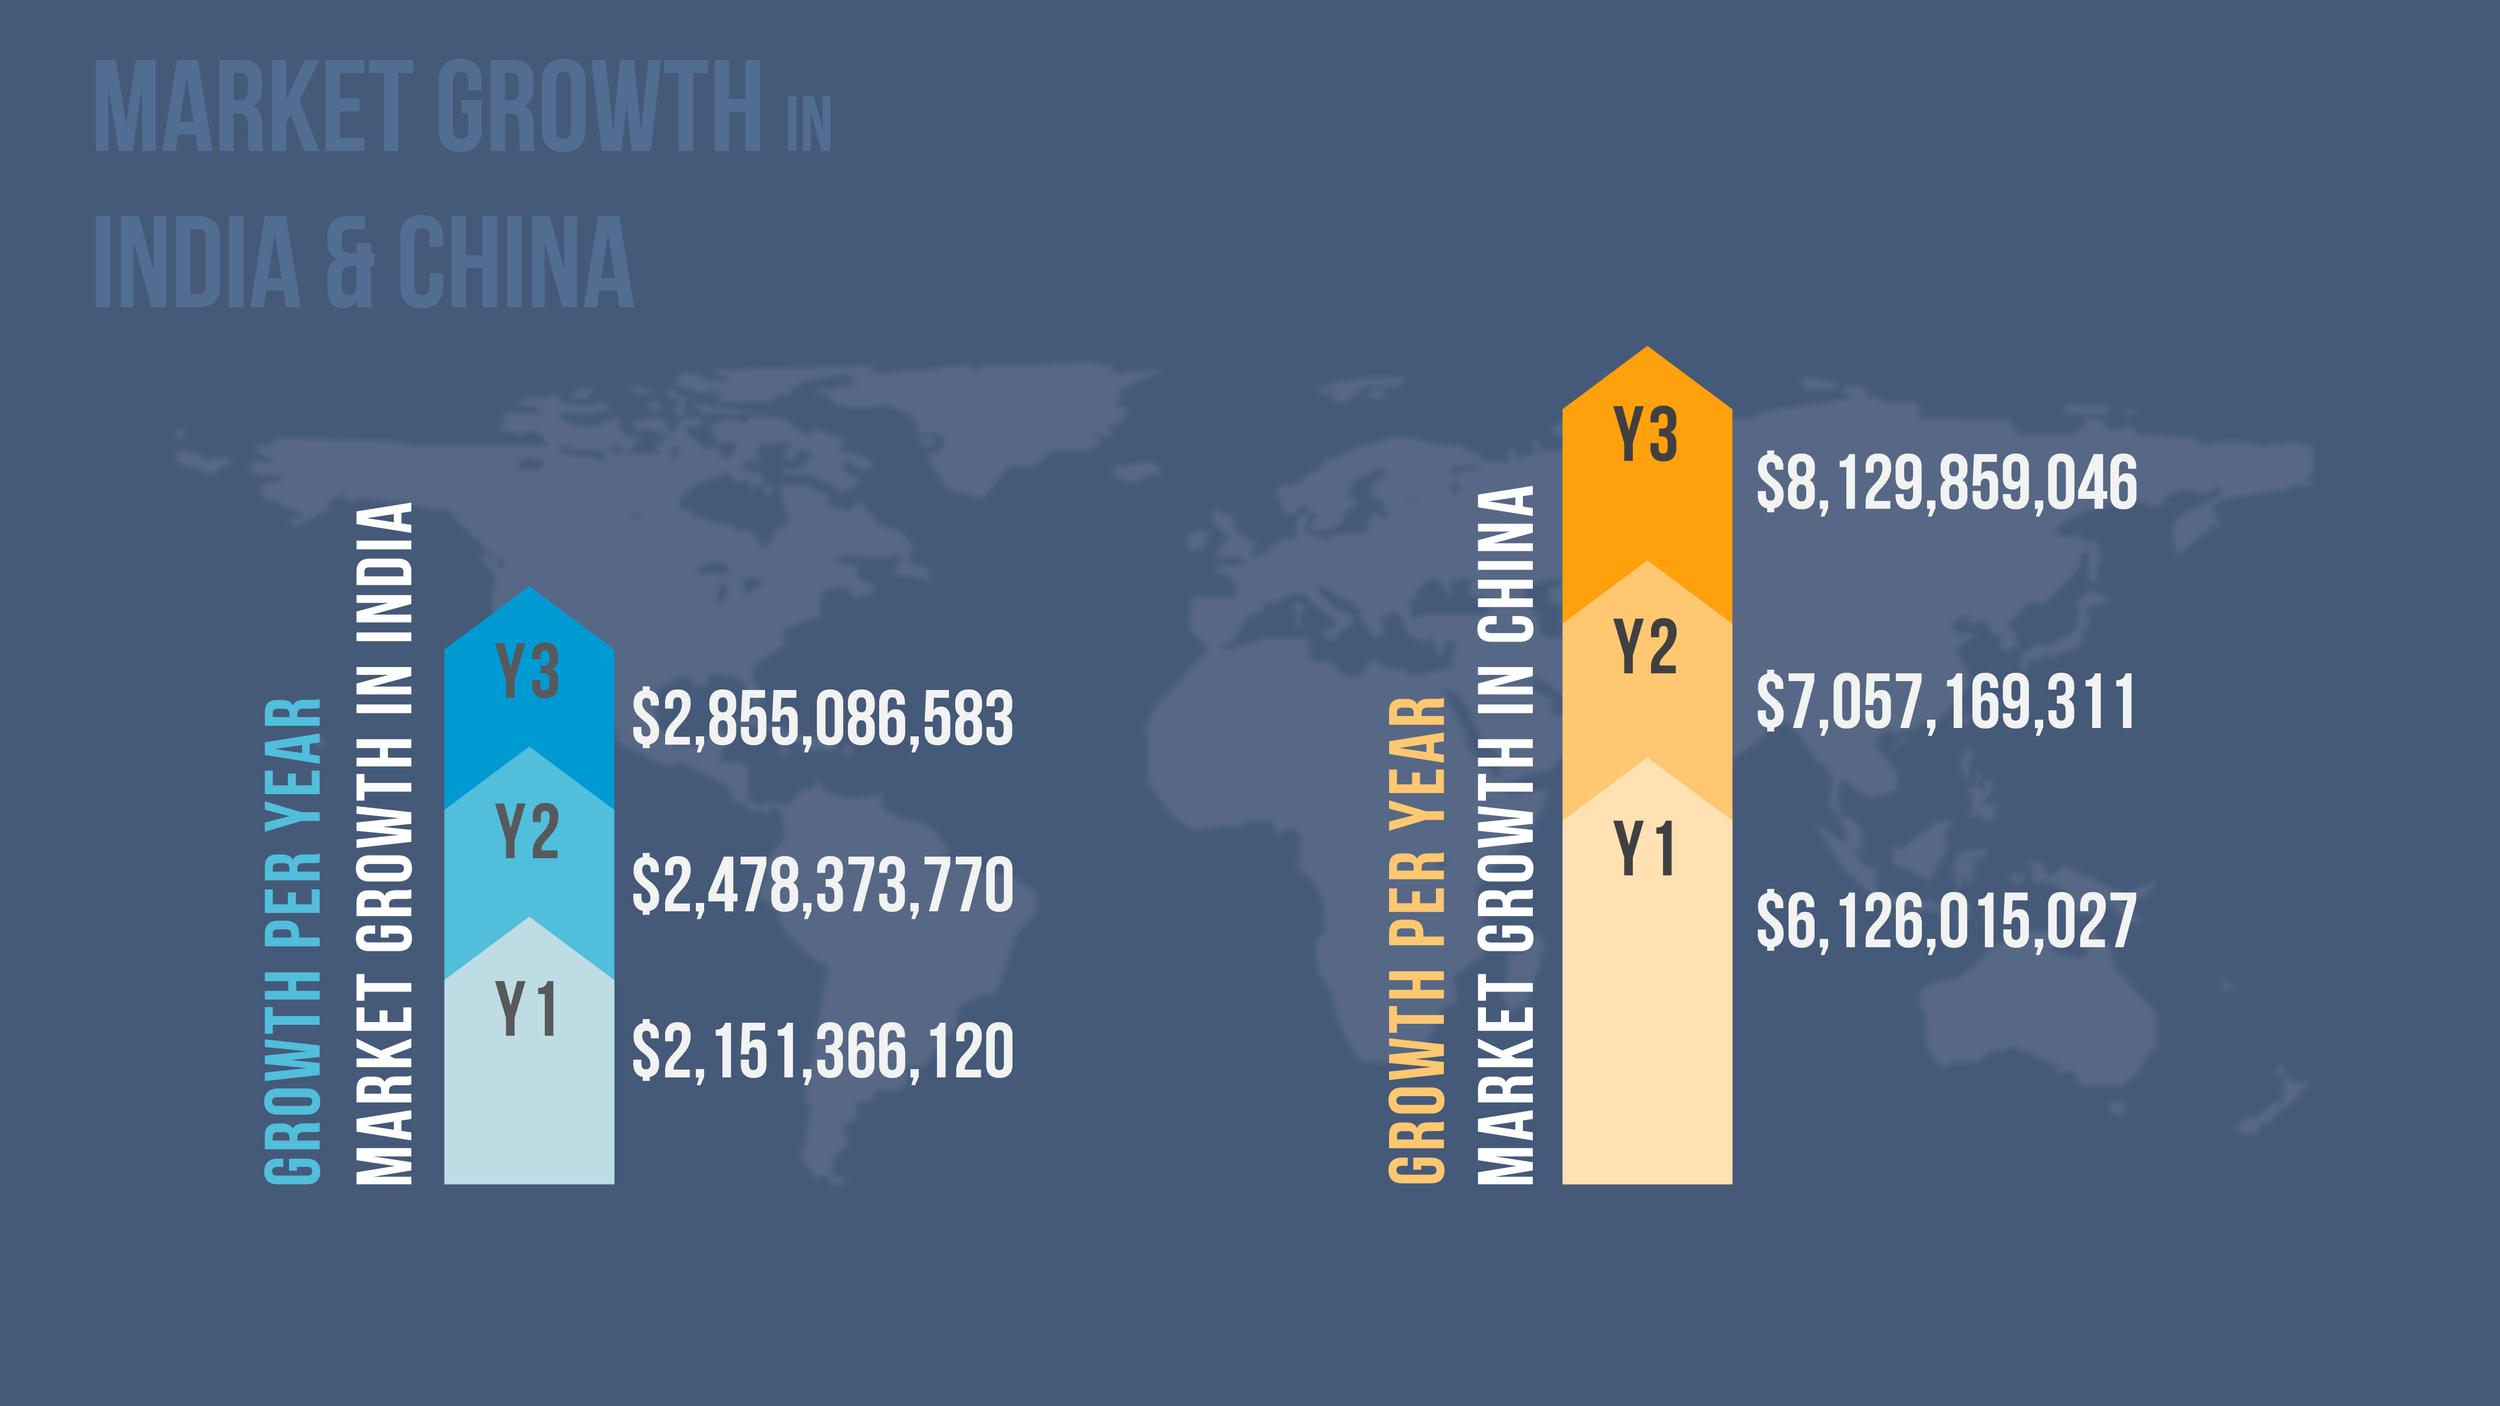 s_growthAsia-01.jpg